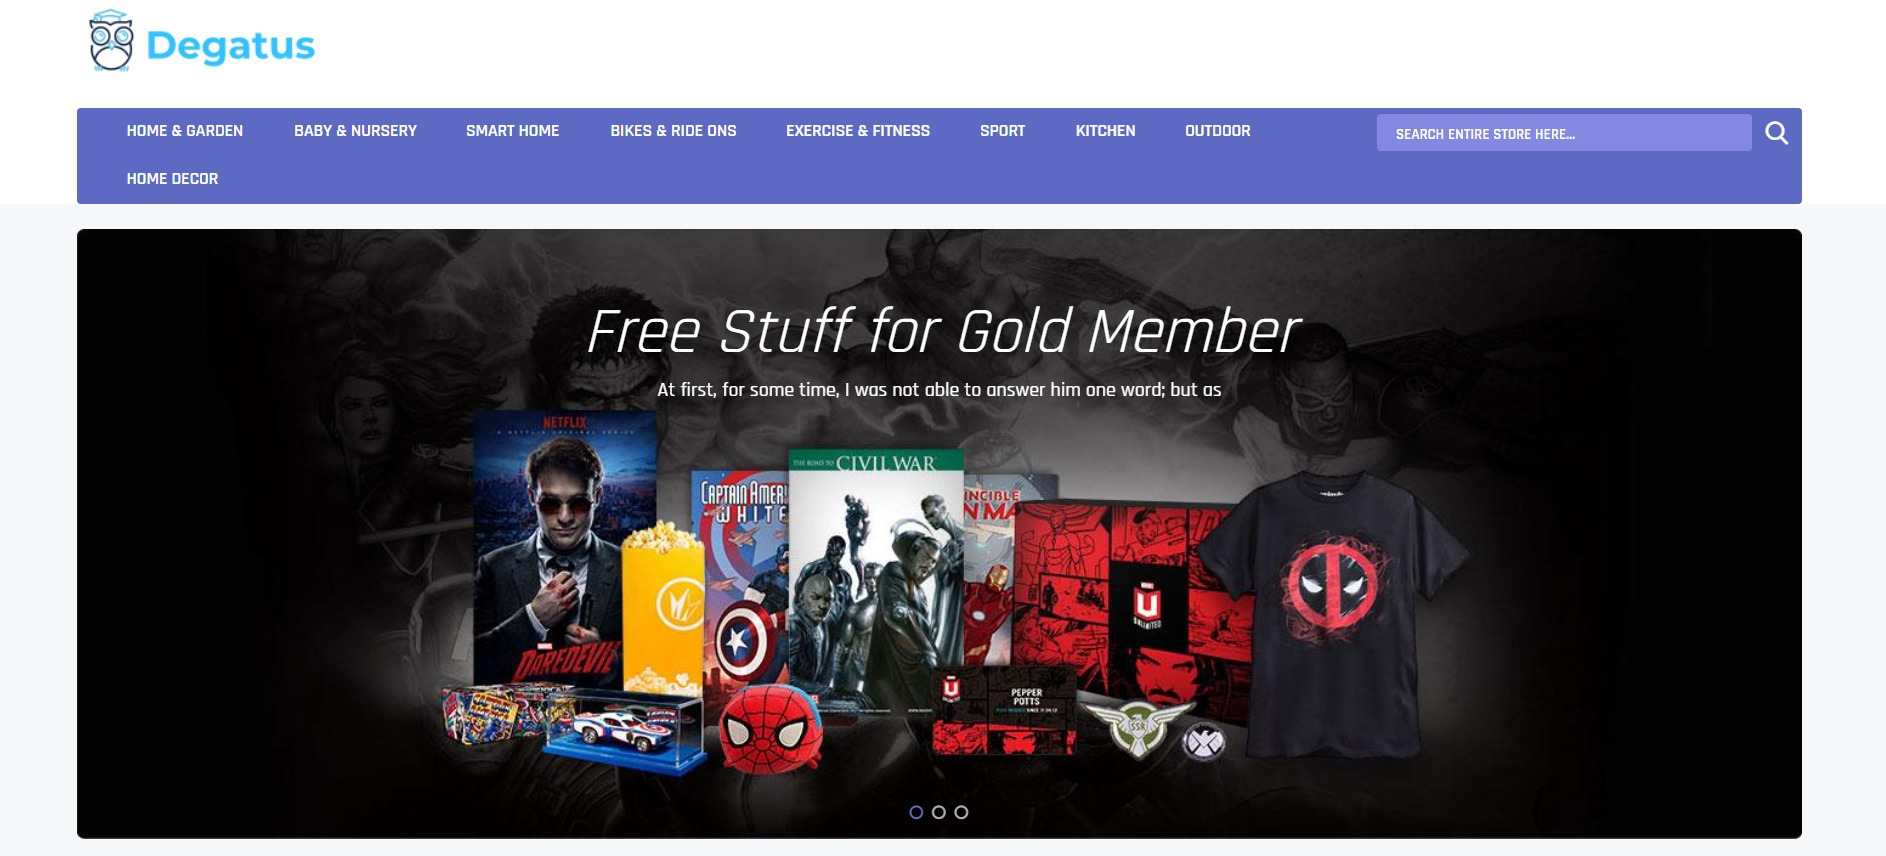 Degatus Reviews  Scam and Fake Online Store at degatus.com